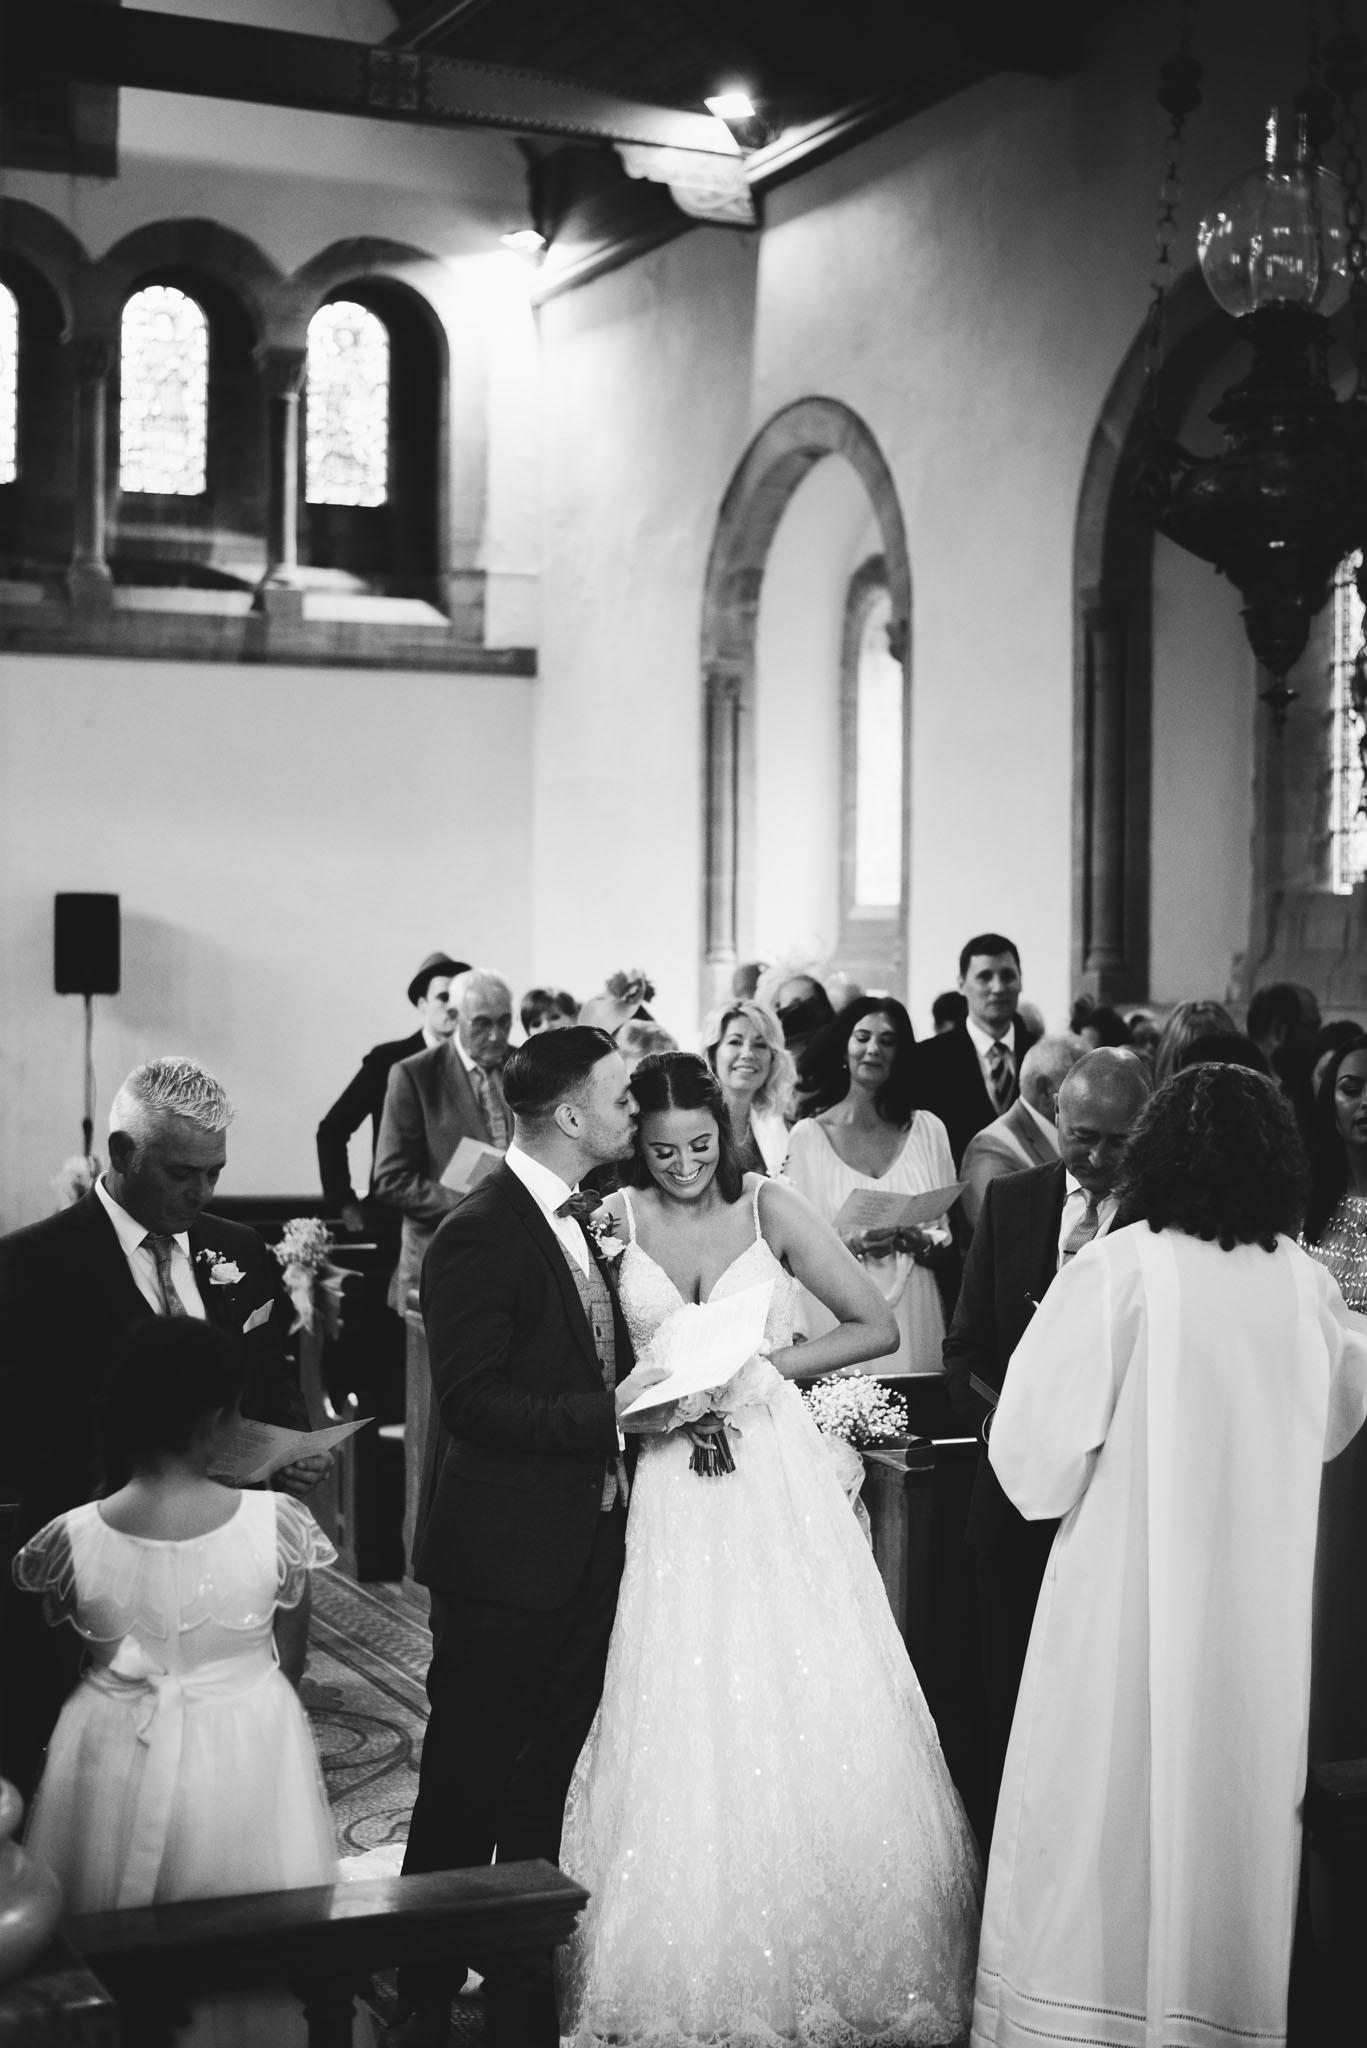 wedding-photographer-glewstone-court-hereford-scott-stockwell-photography175.jpg